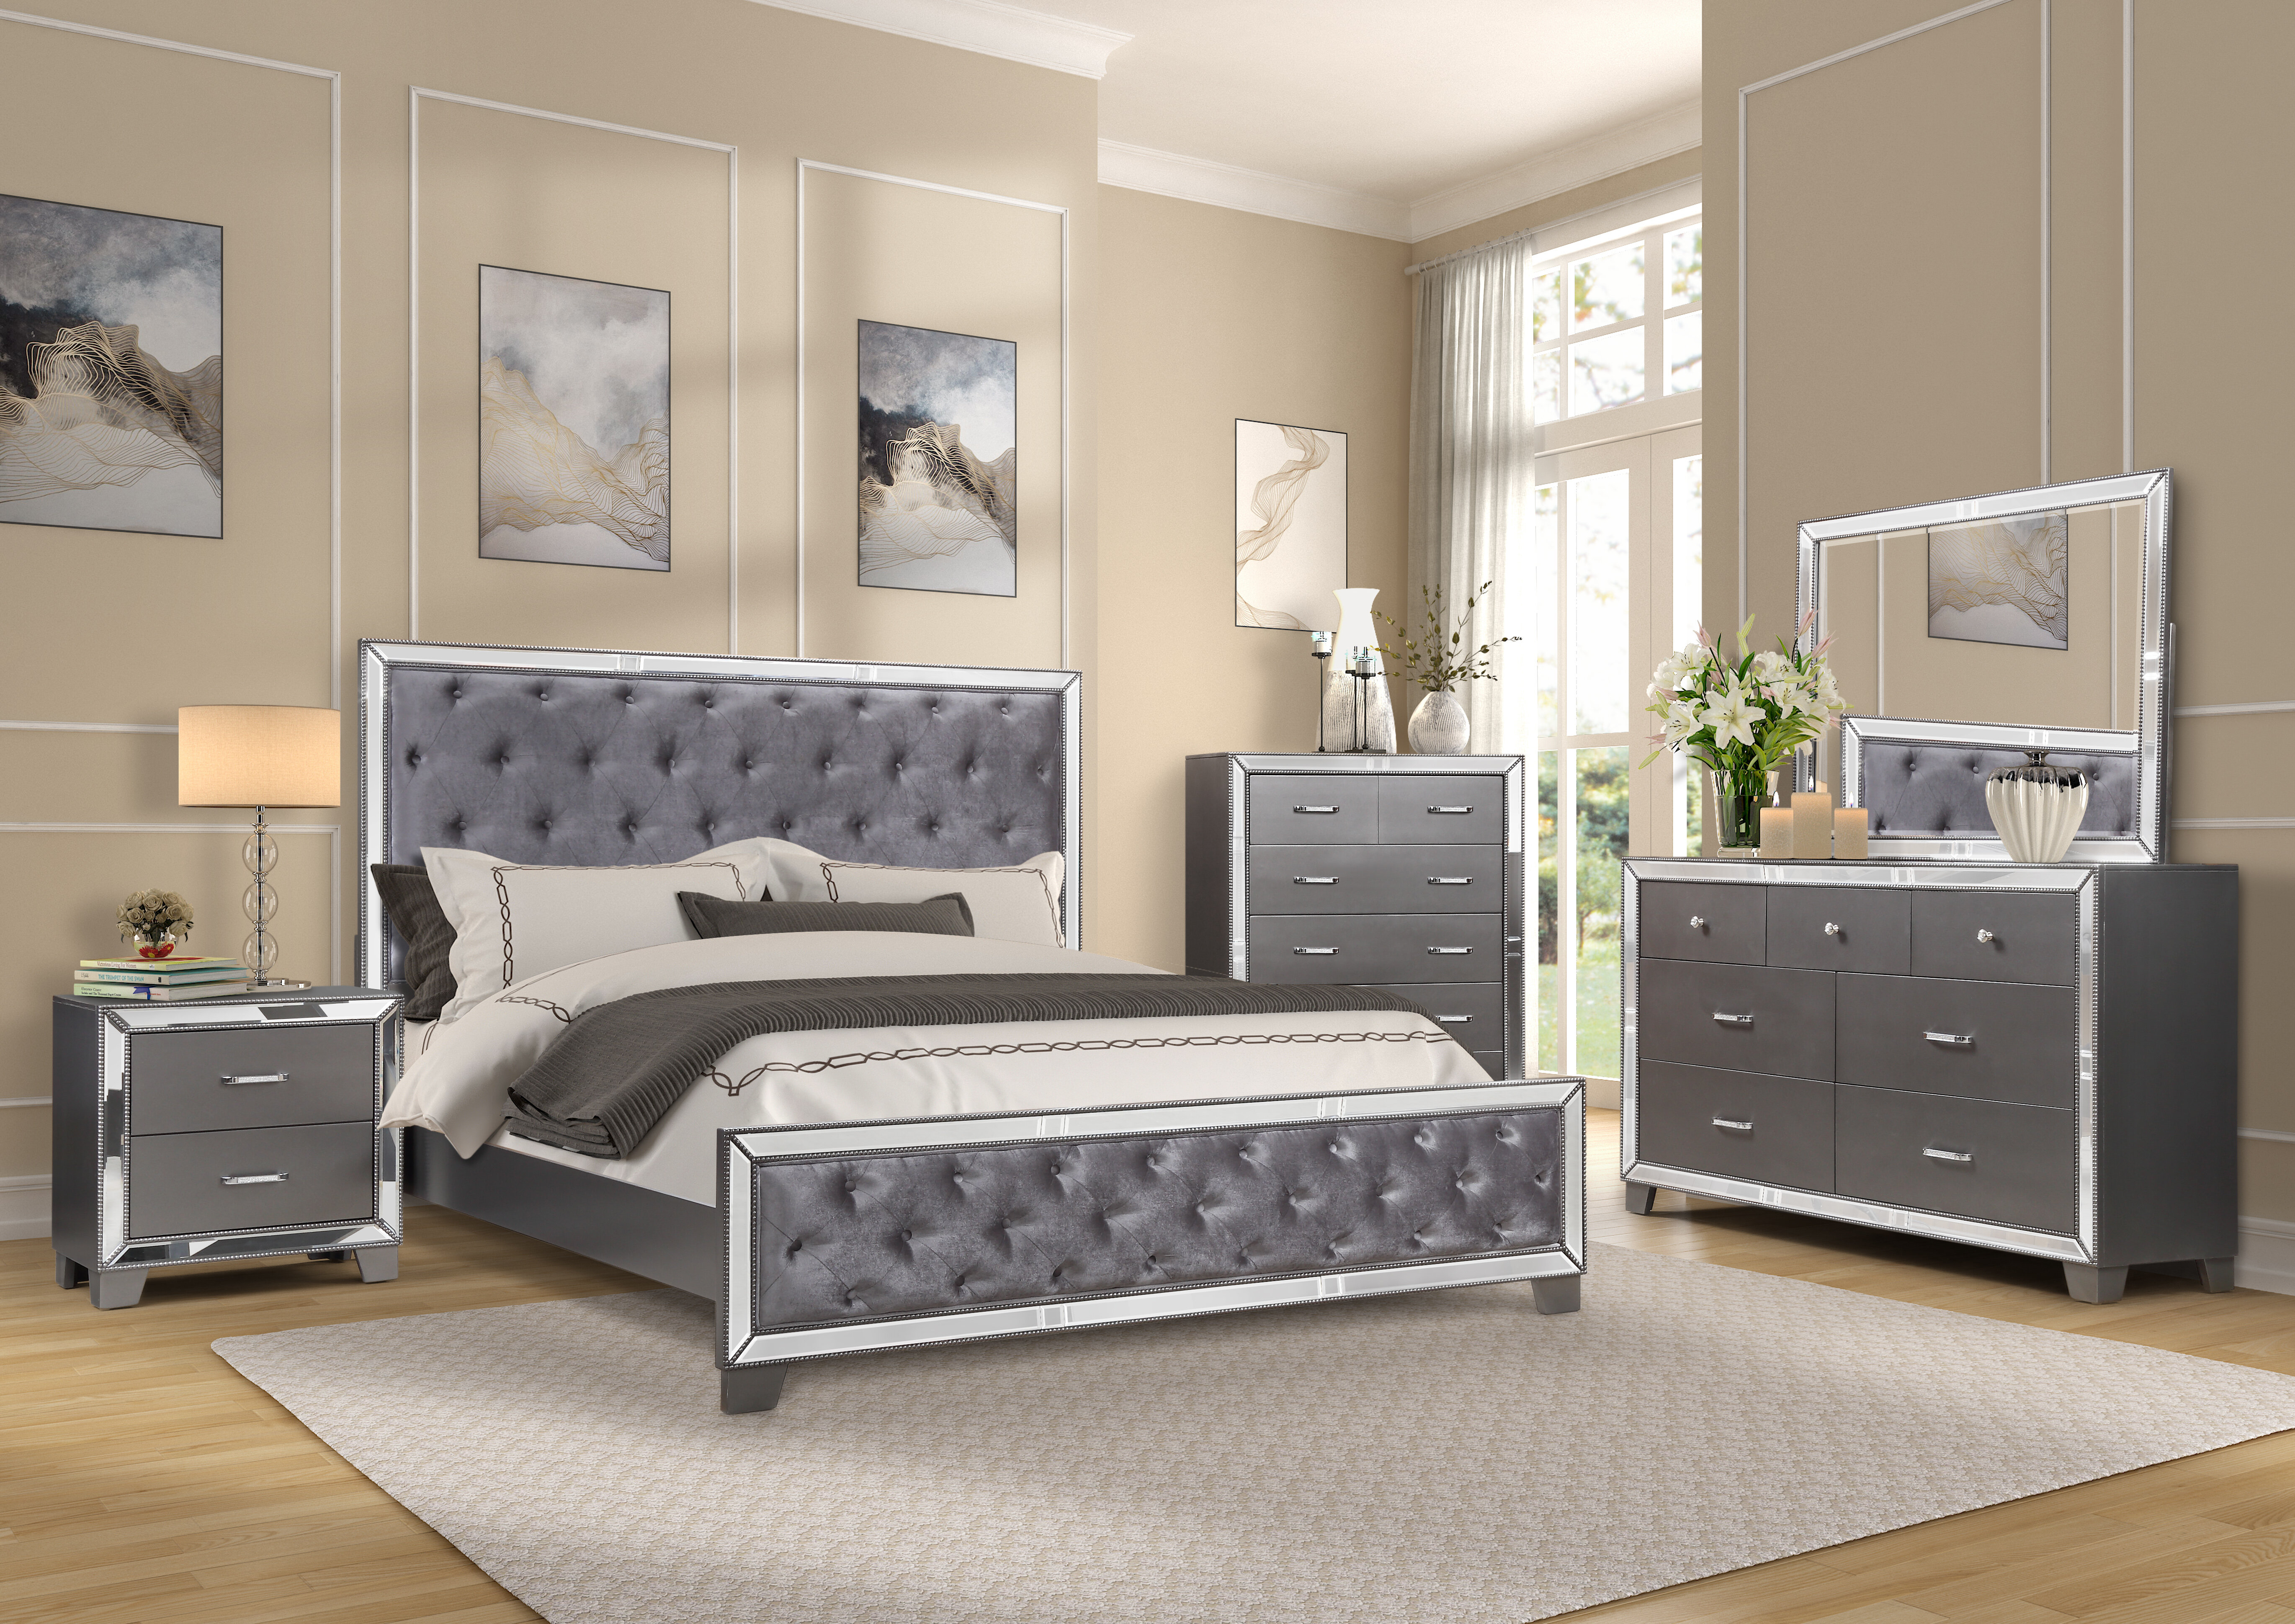 Wayfair Glam Bedroom Sets You Ll Love In 2021